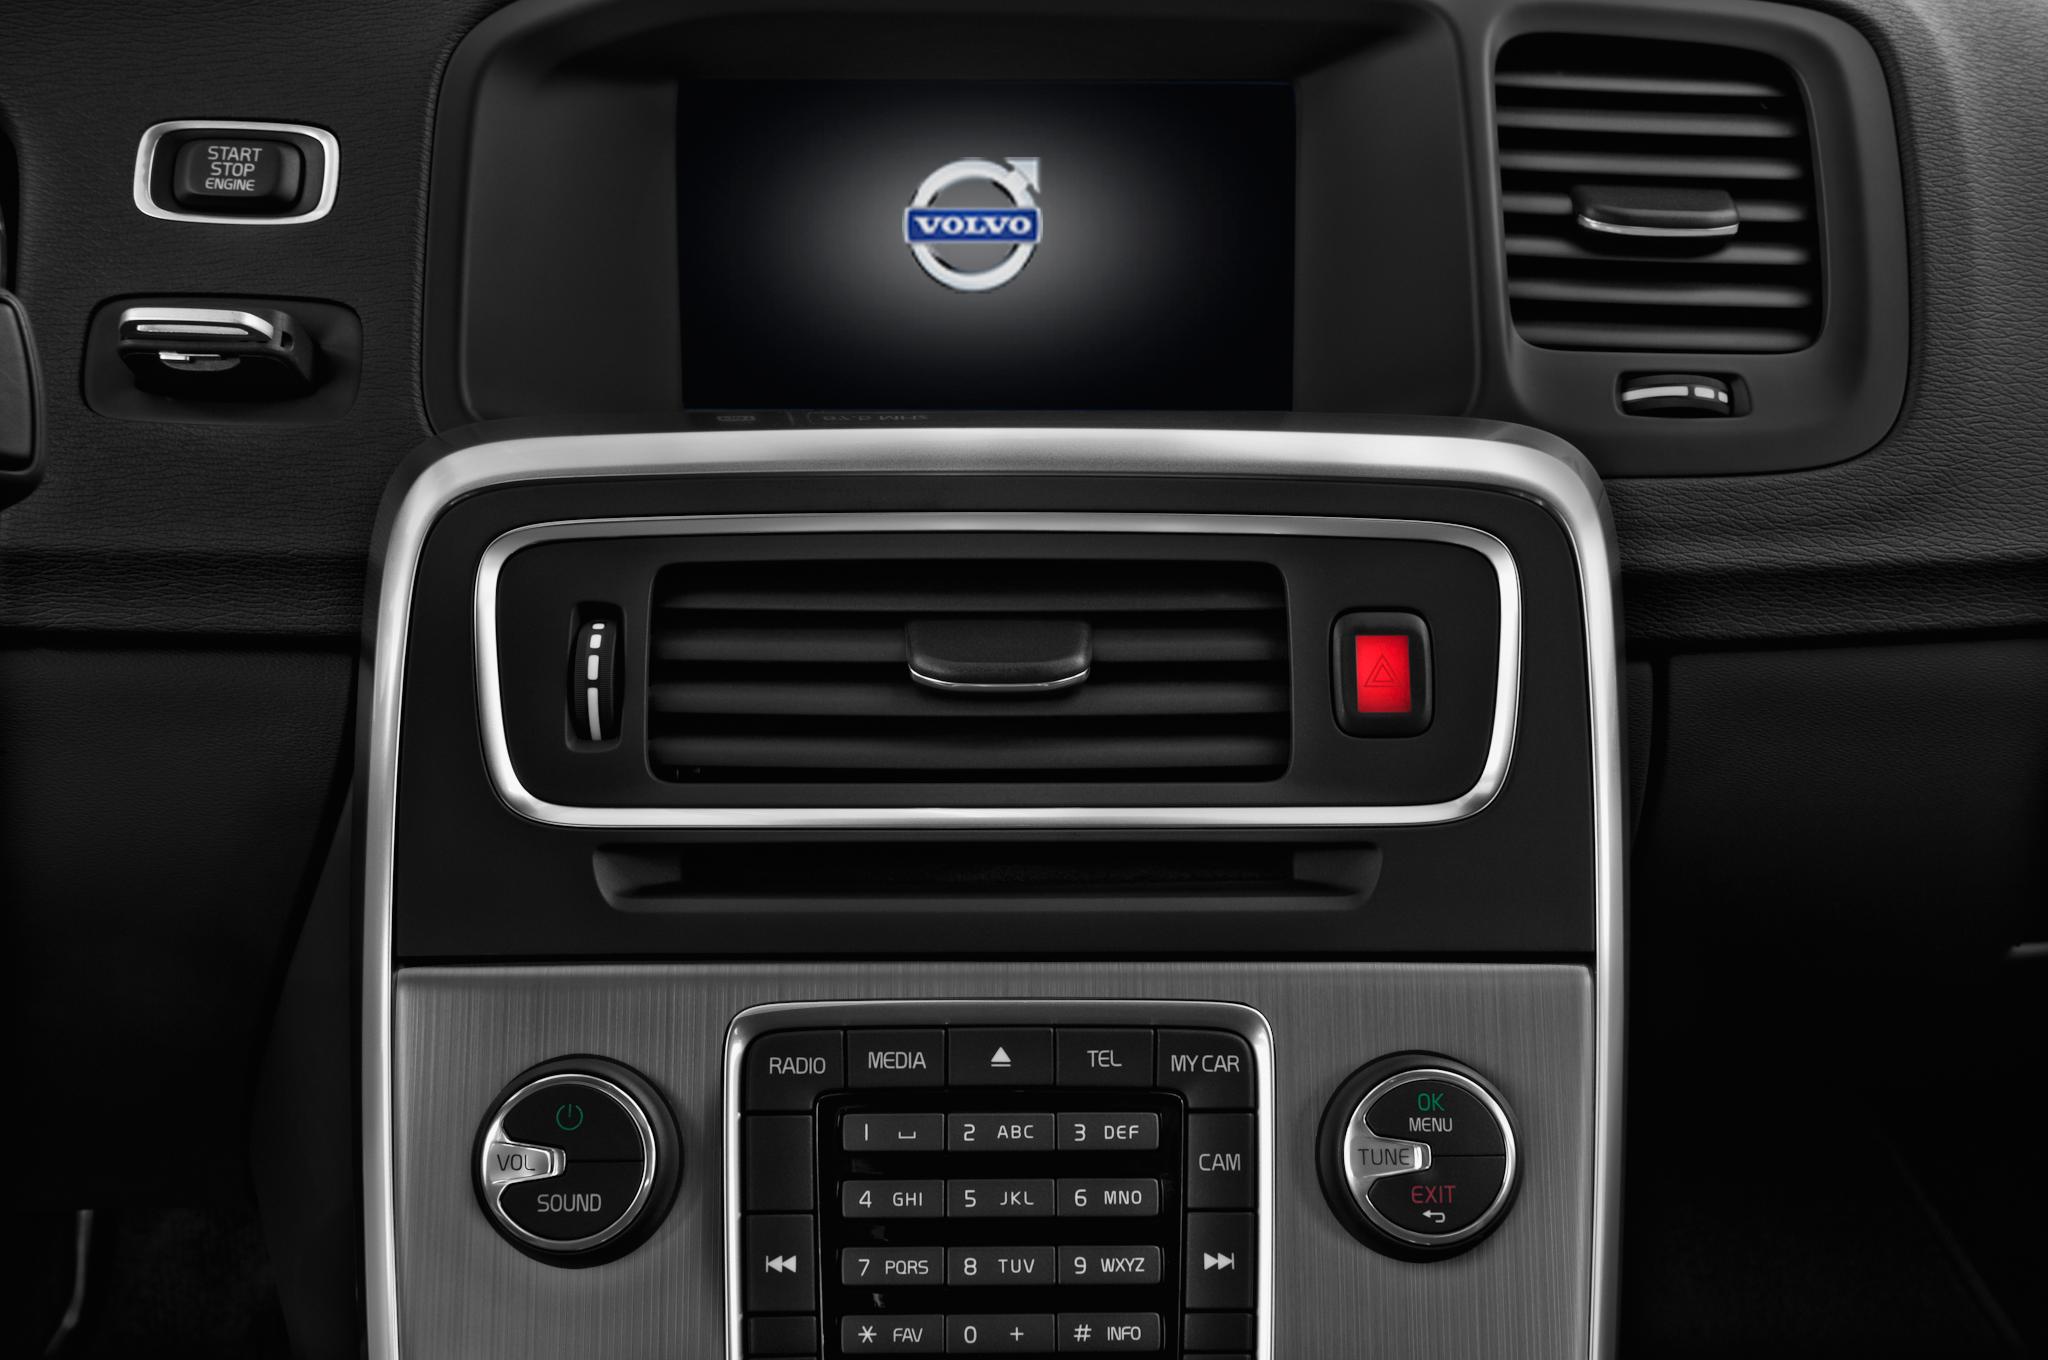 Volvo S60 Radio Removal